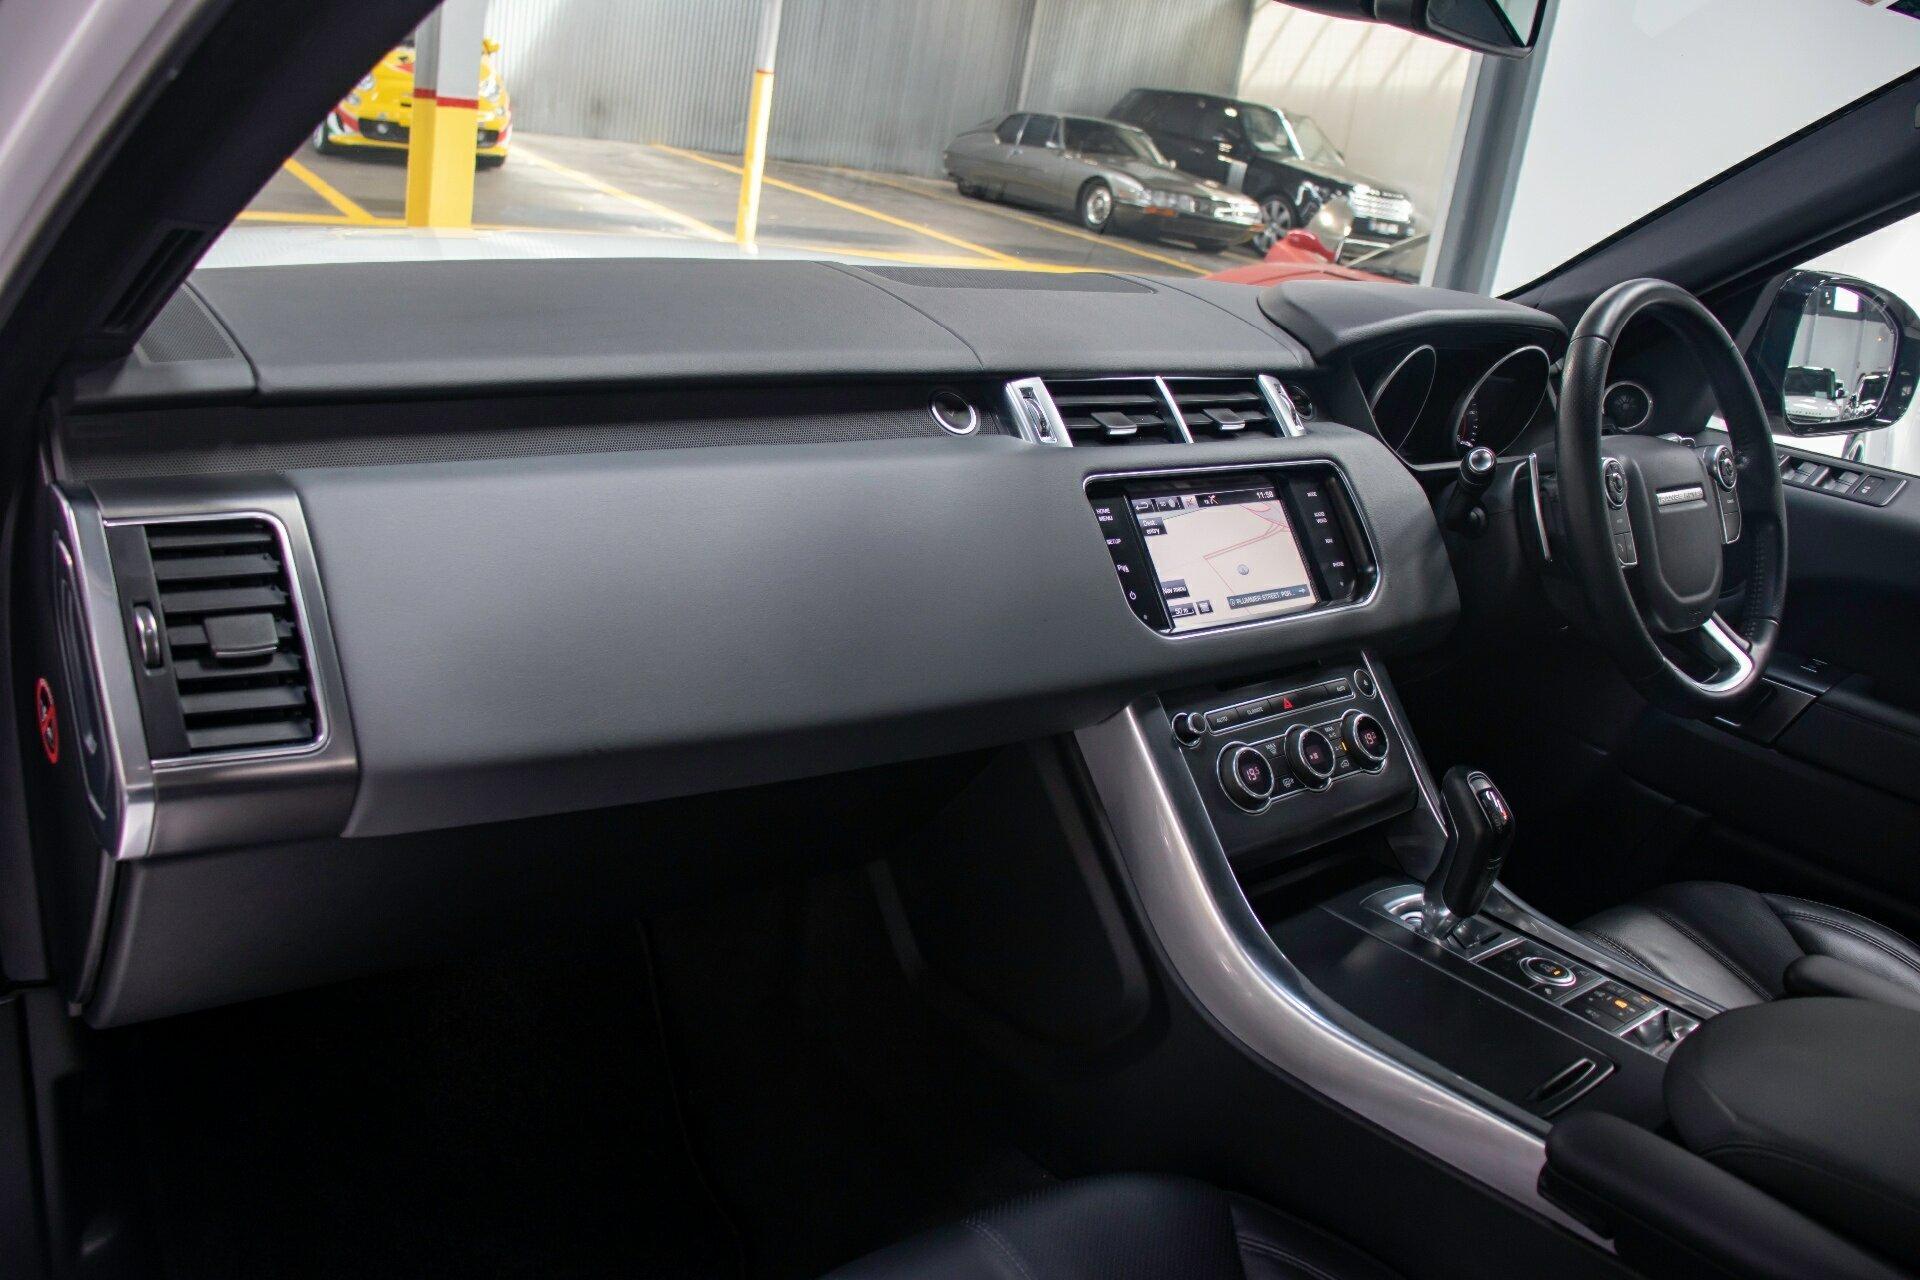 2014 Land Rover Range Rover Sport 3.0 Sdv6 Se Lw